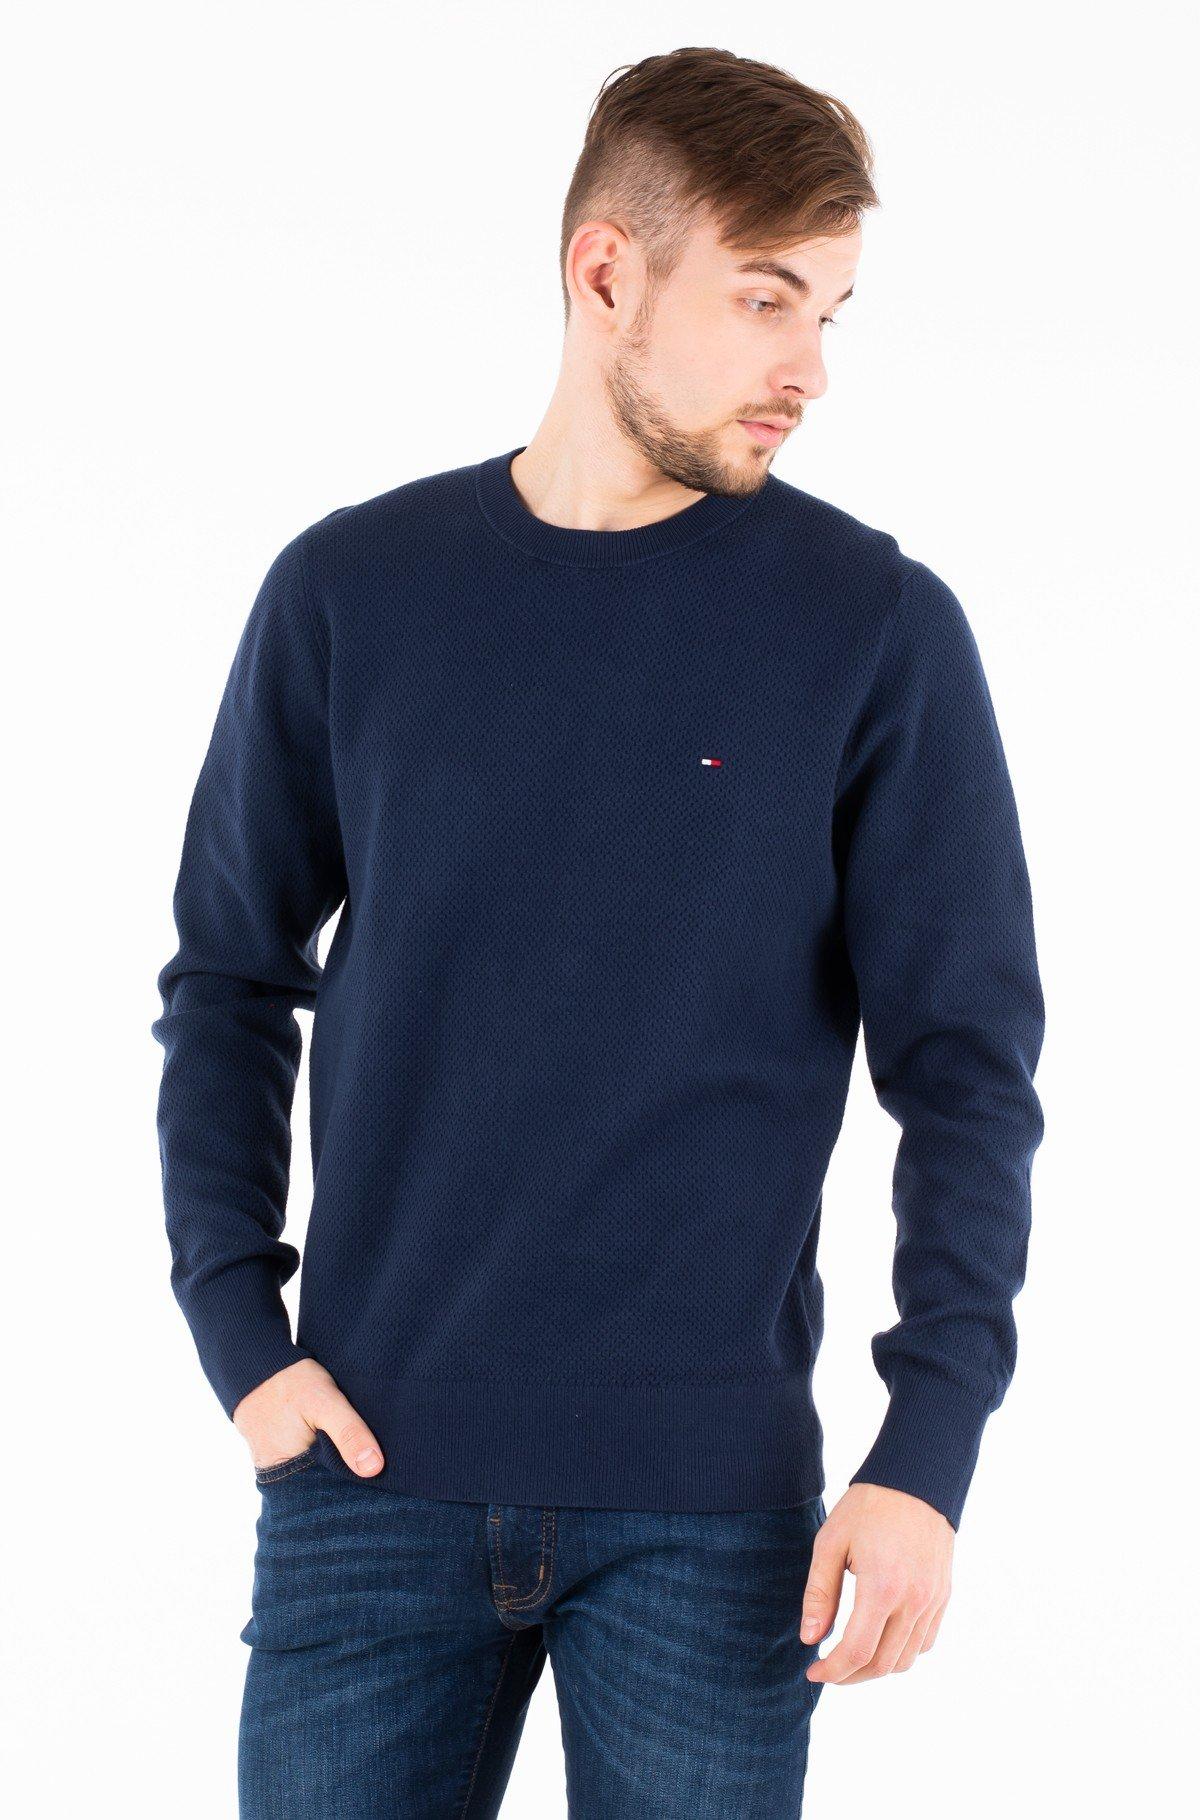 Sweater COTTON MESH STRUCTURED CREW NECK-full-1